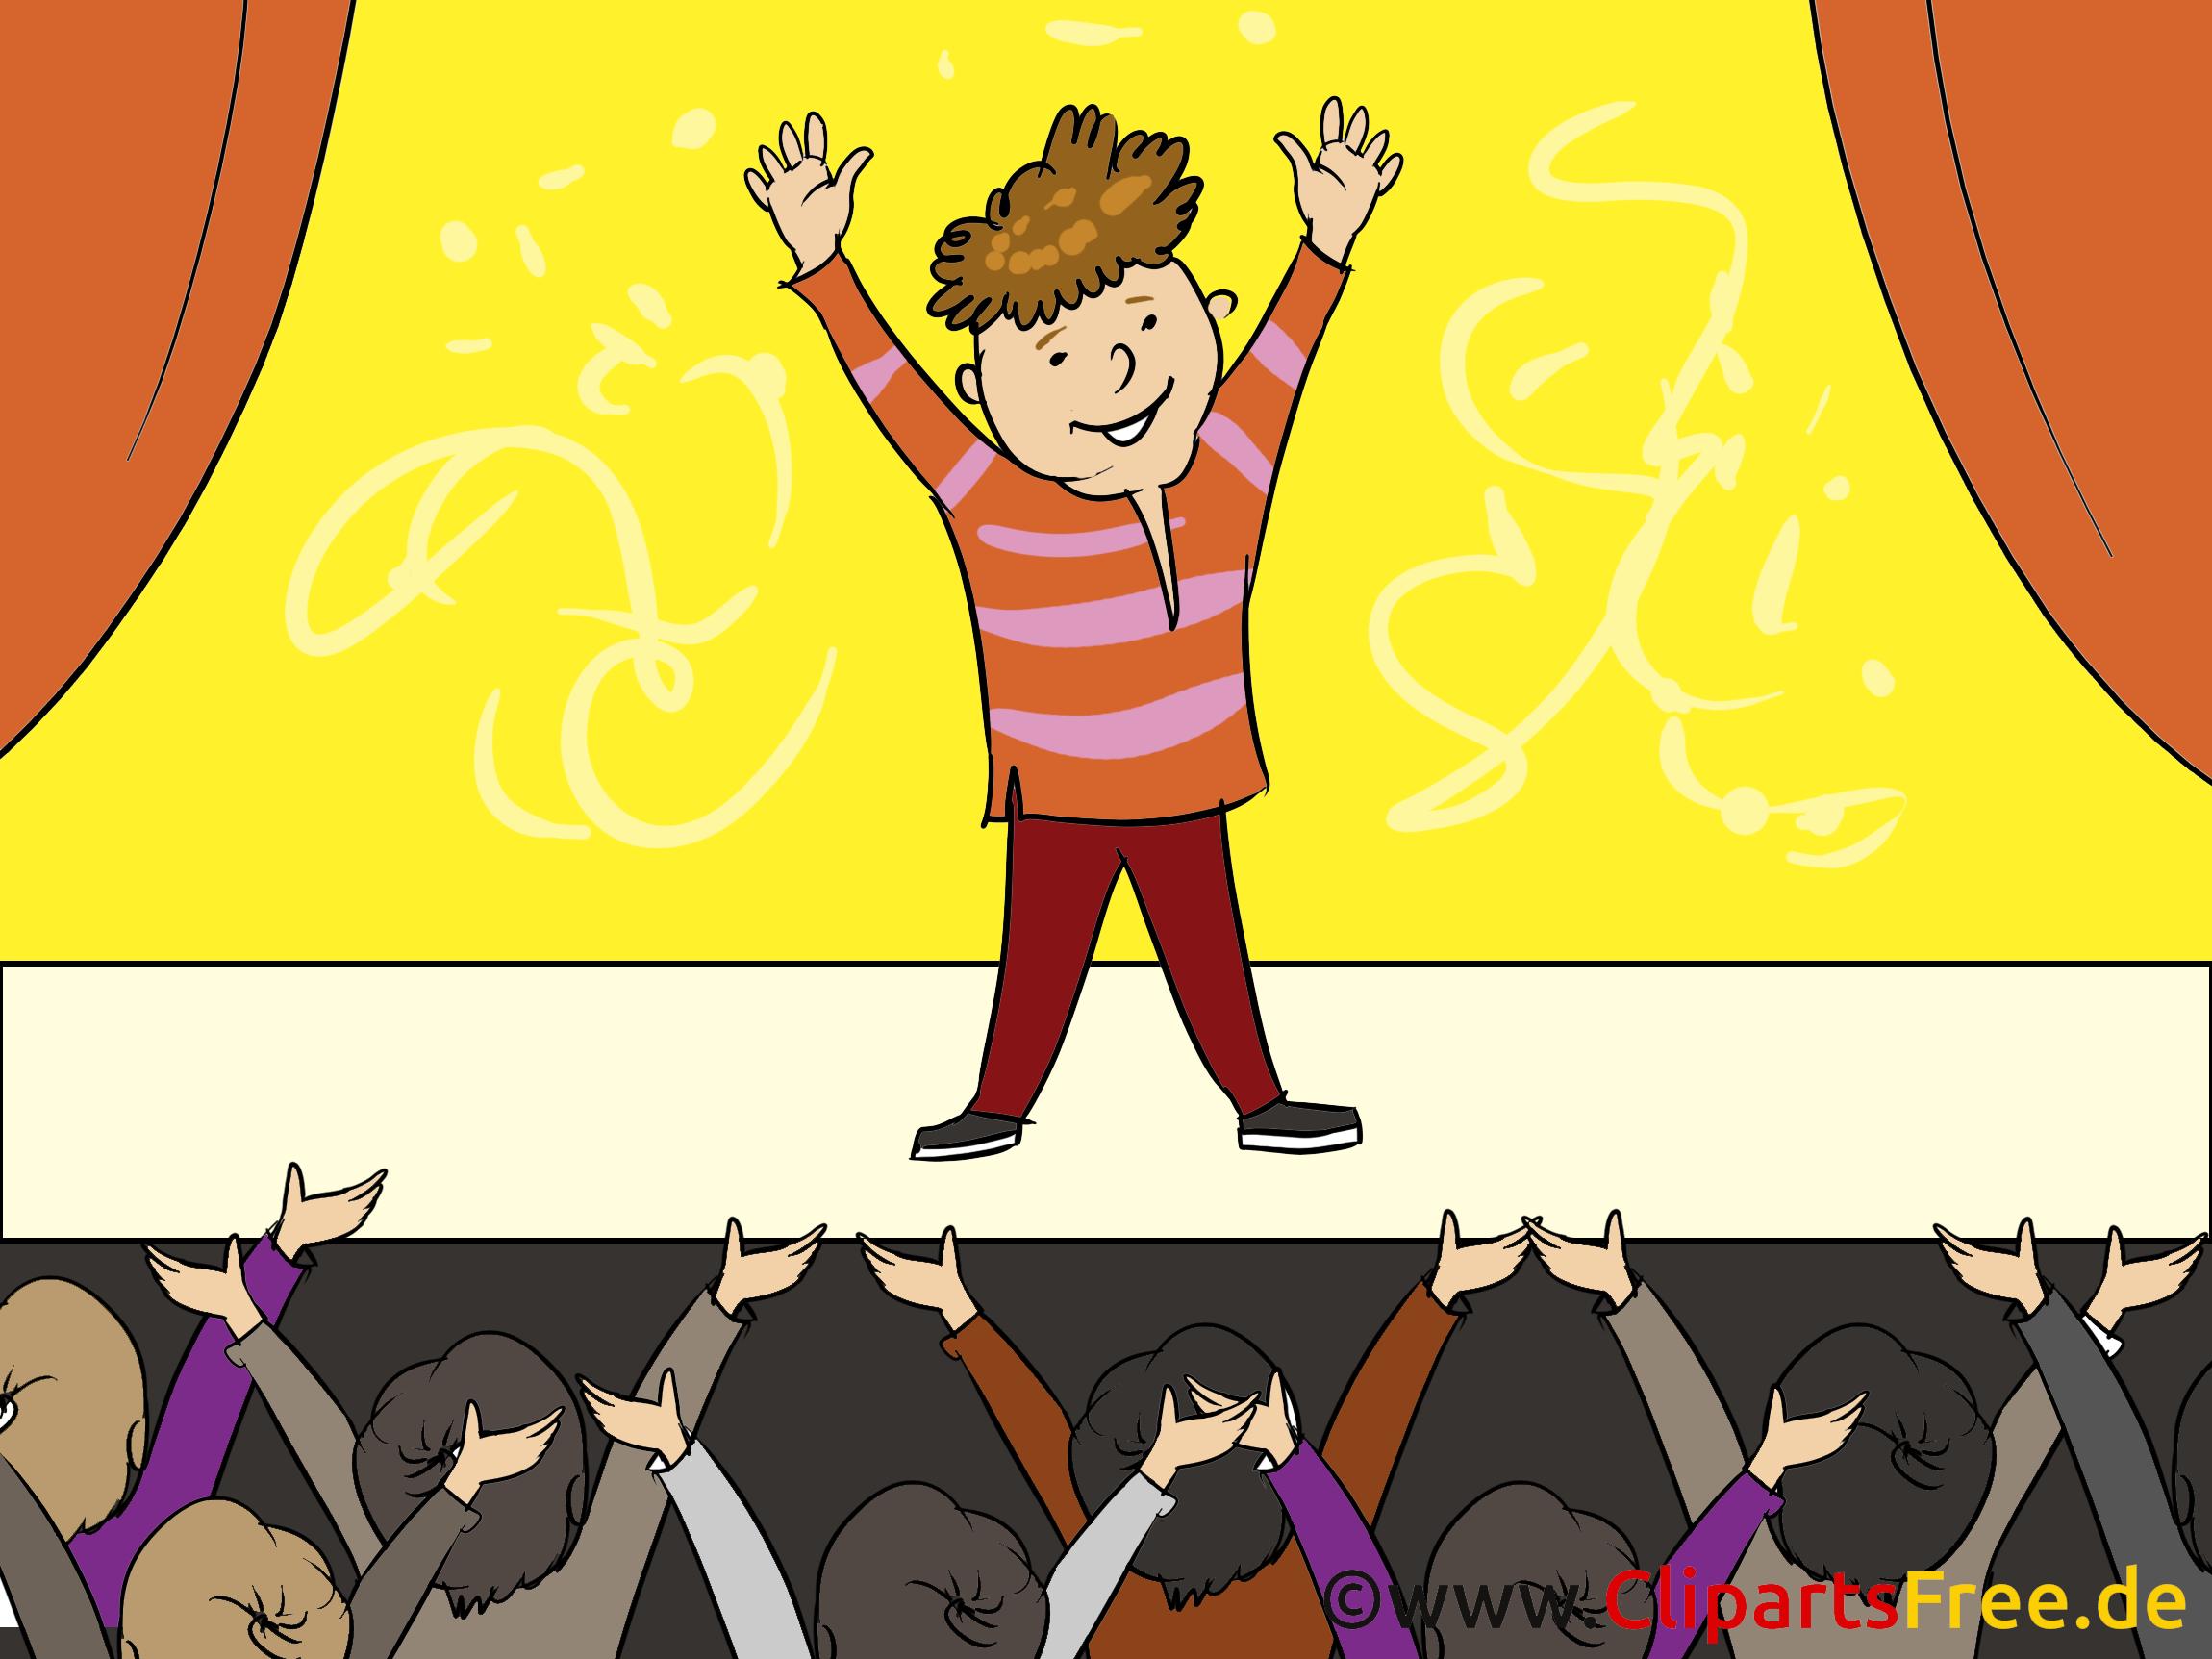 Erfolg Bild, Clipart, Grafik, Cartoon, Illustration